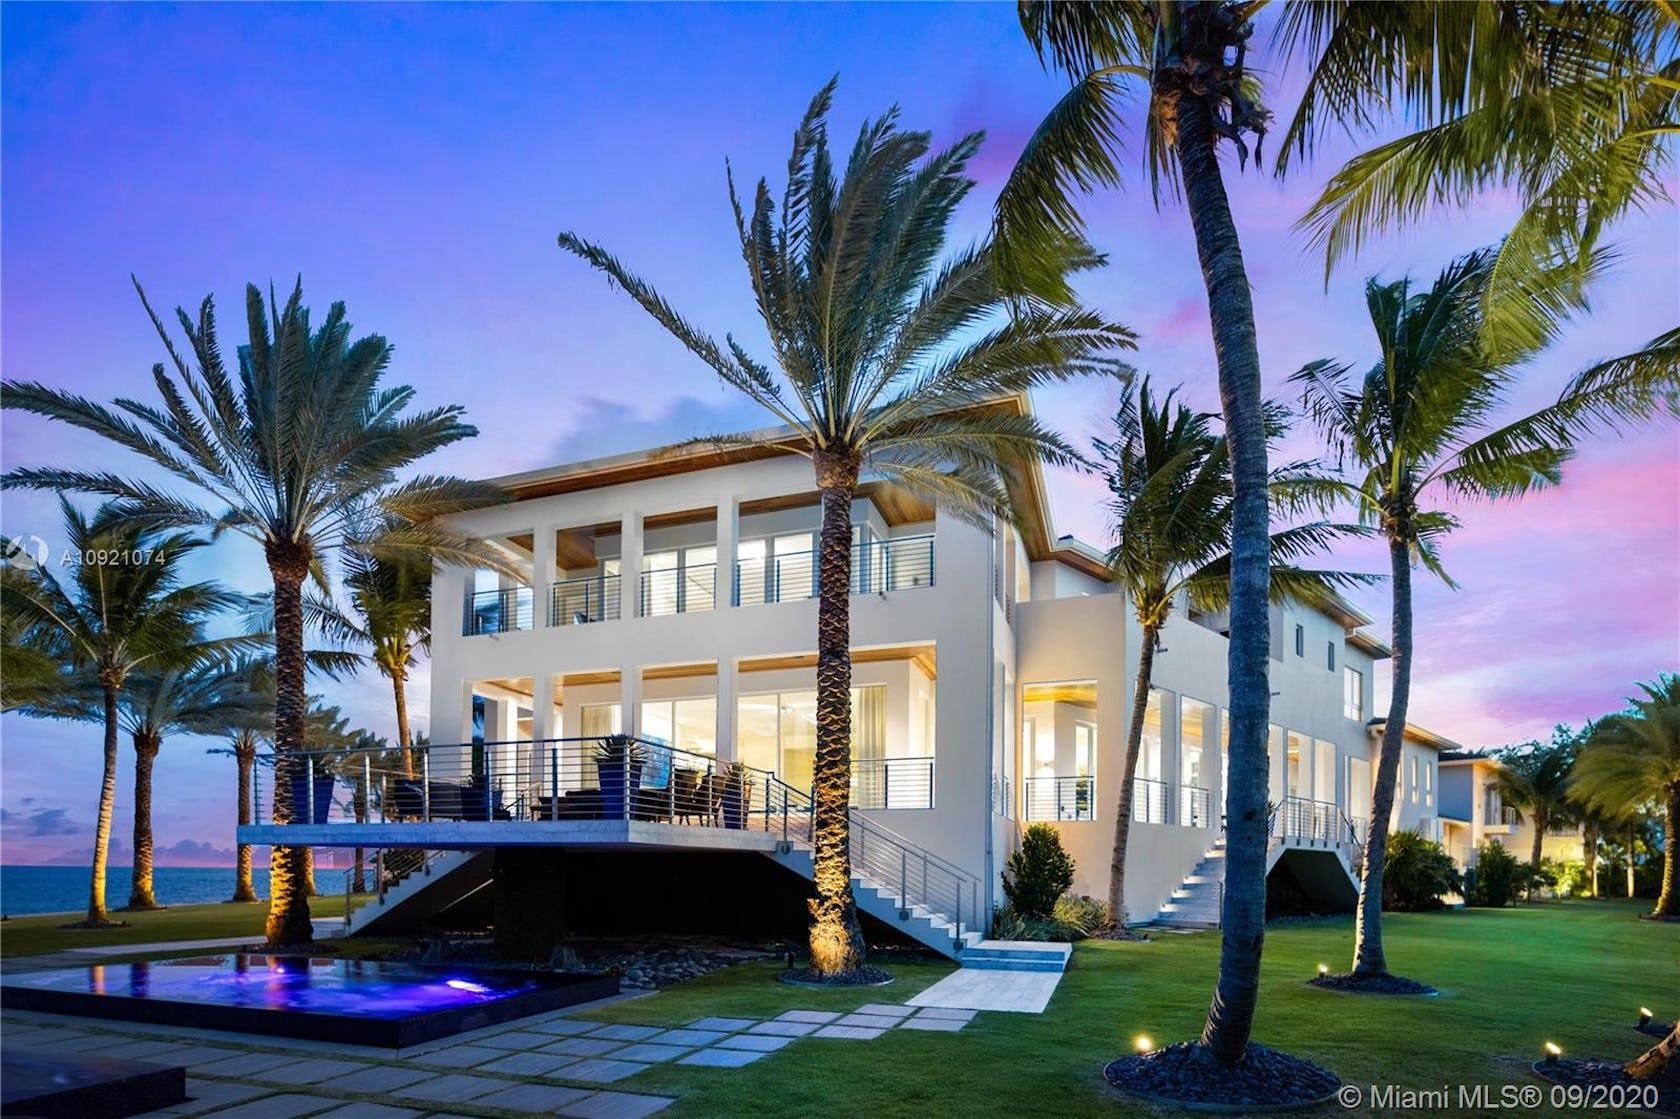 villa housing building house plant palm tree tree grass hotel mansion